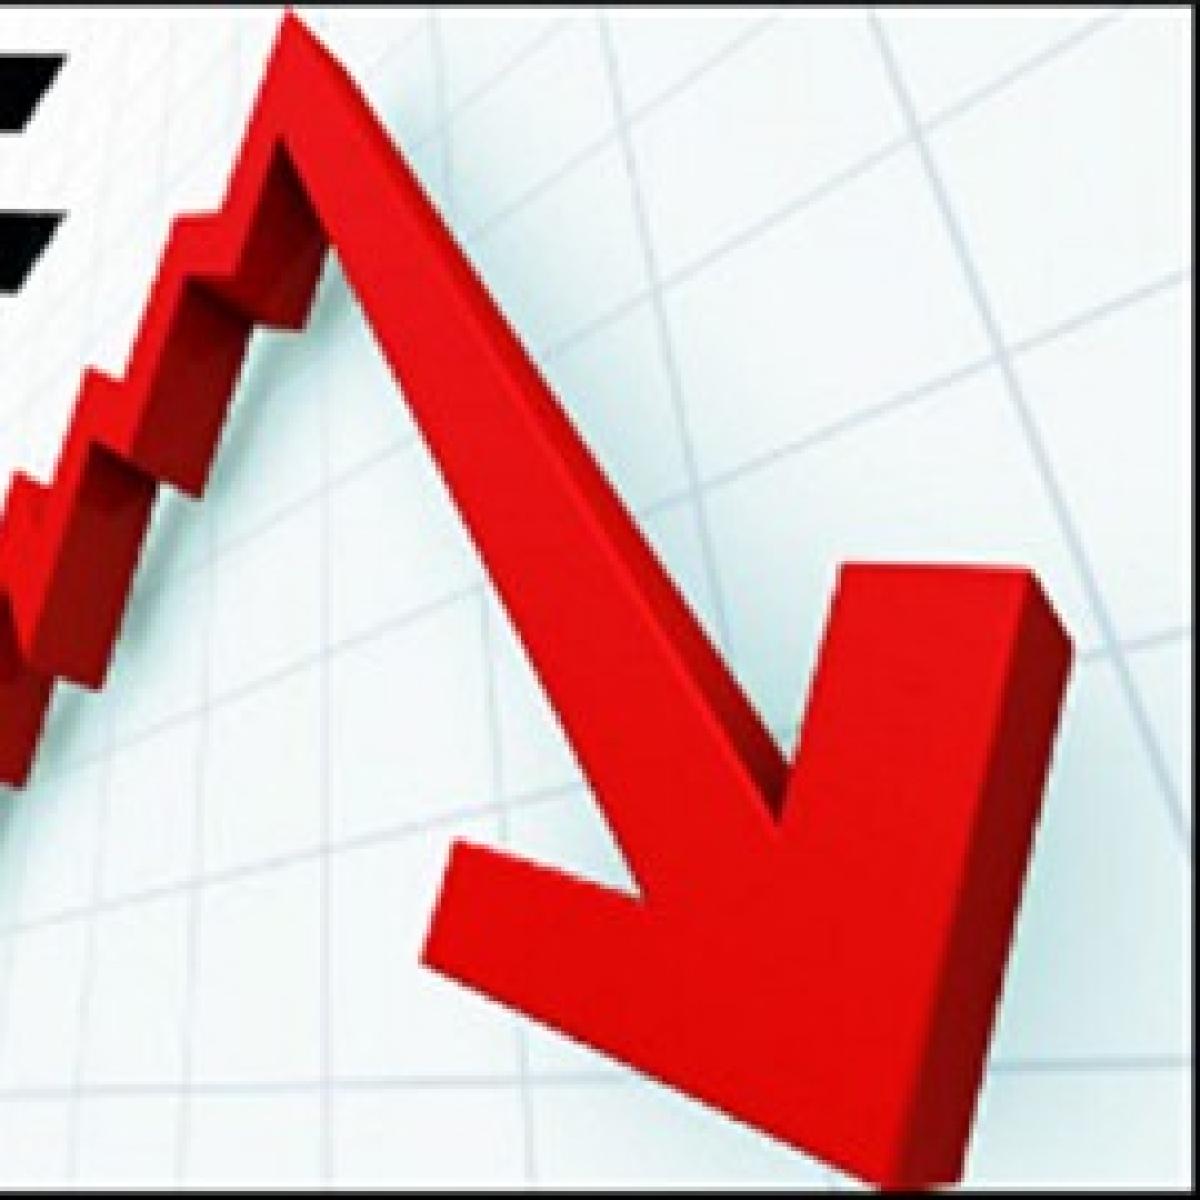 'Multiple headwinds play spoilsport on Q2 revenue growth'